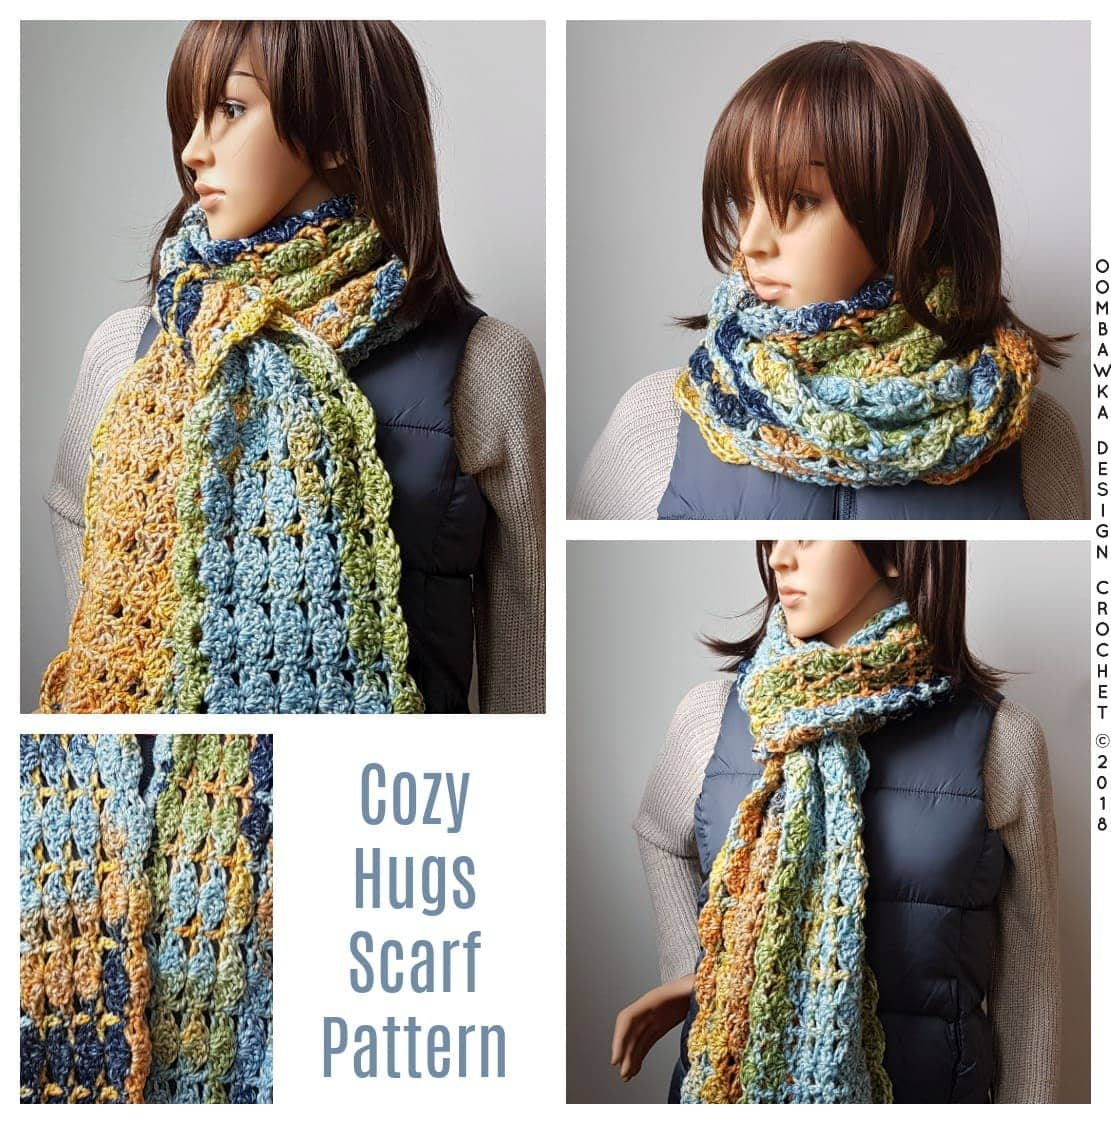 Cozy Hugs Scarf Pattern. Oombawka Design Crochet Pattern. #scarfofthemonthclub2018